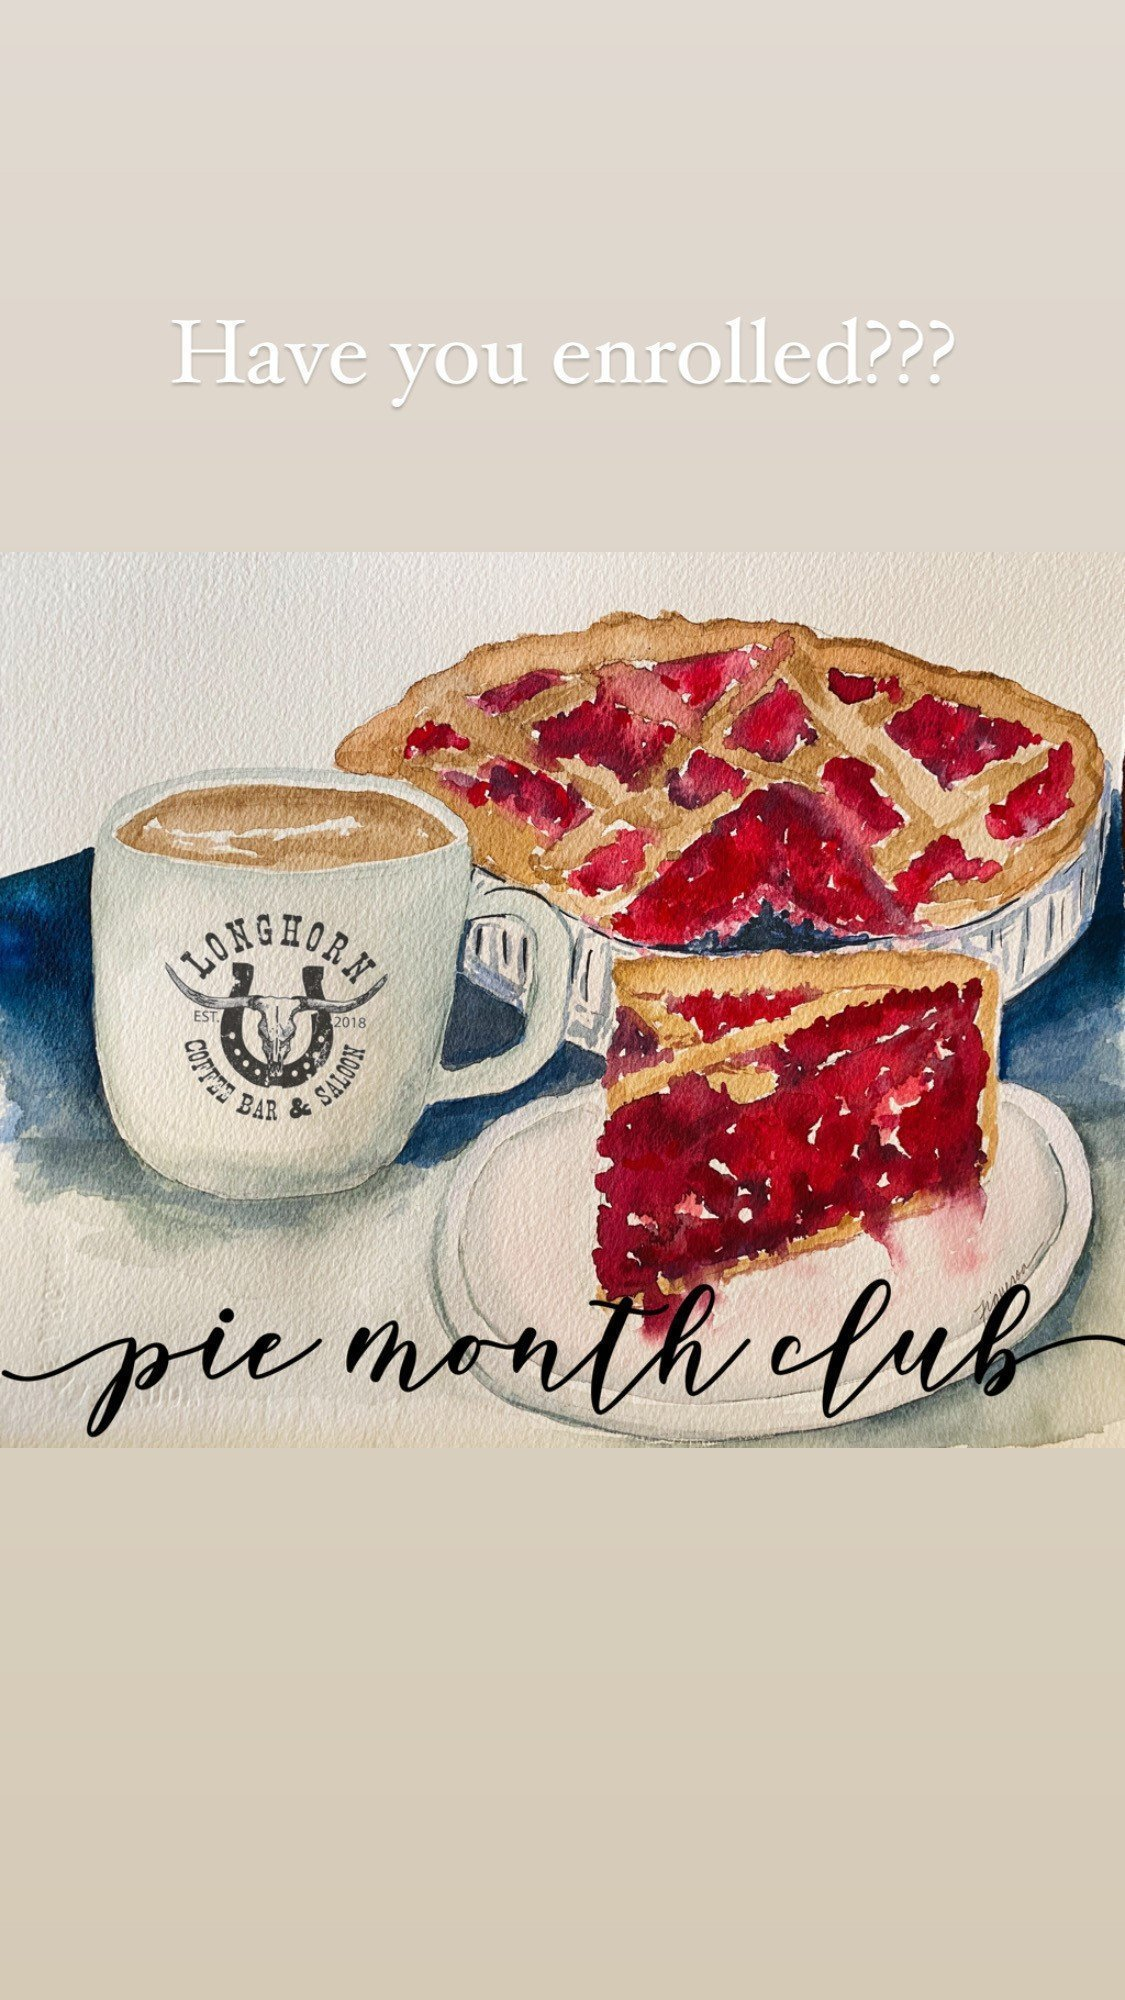 PIE & COFFEE MONTH CLUB